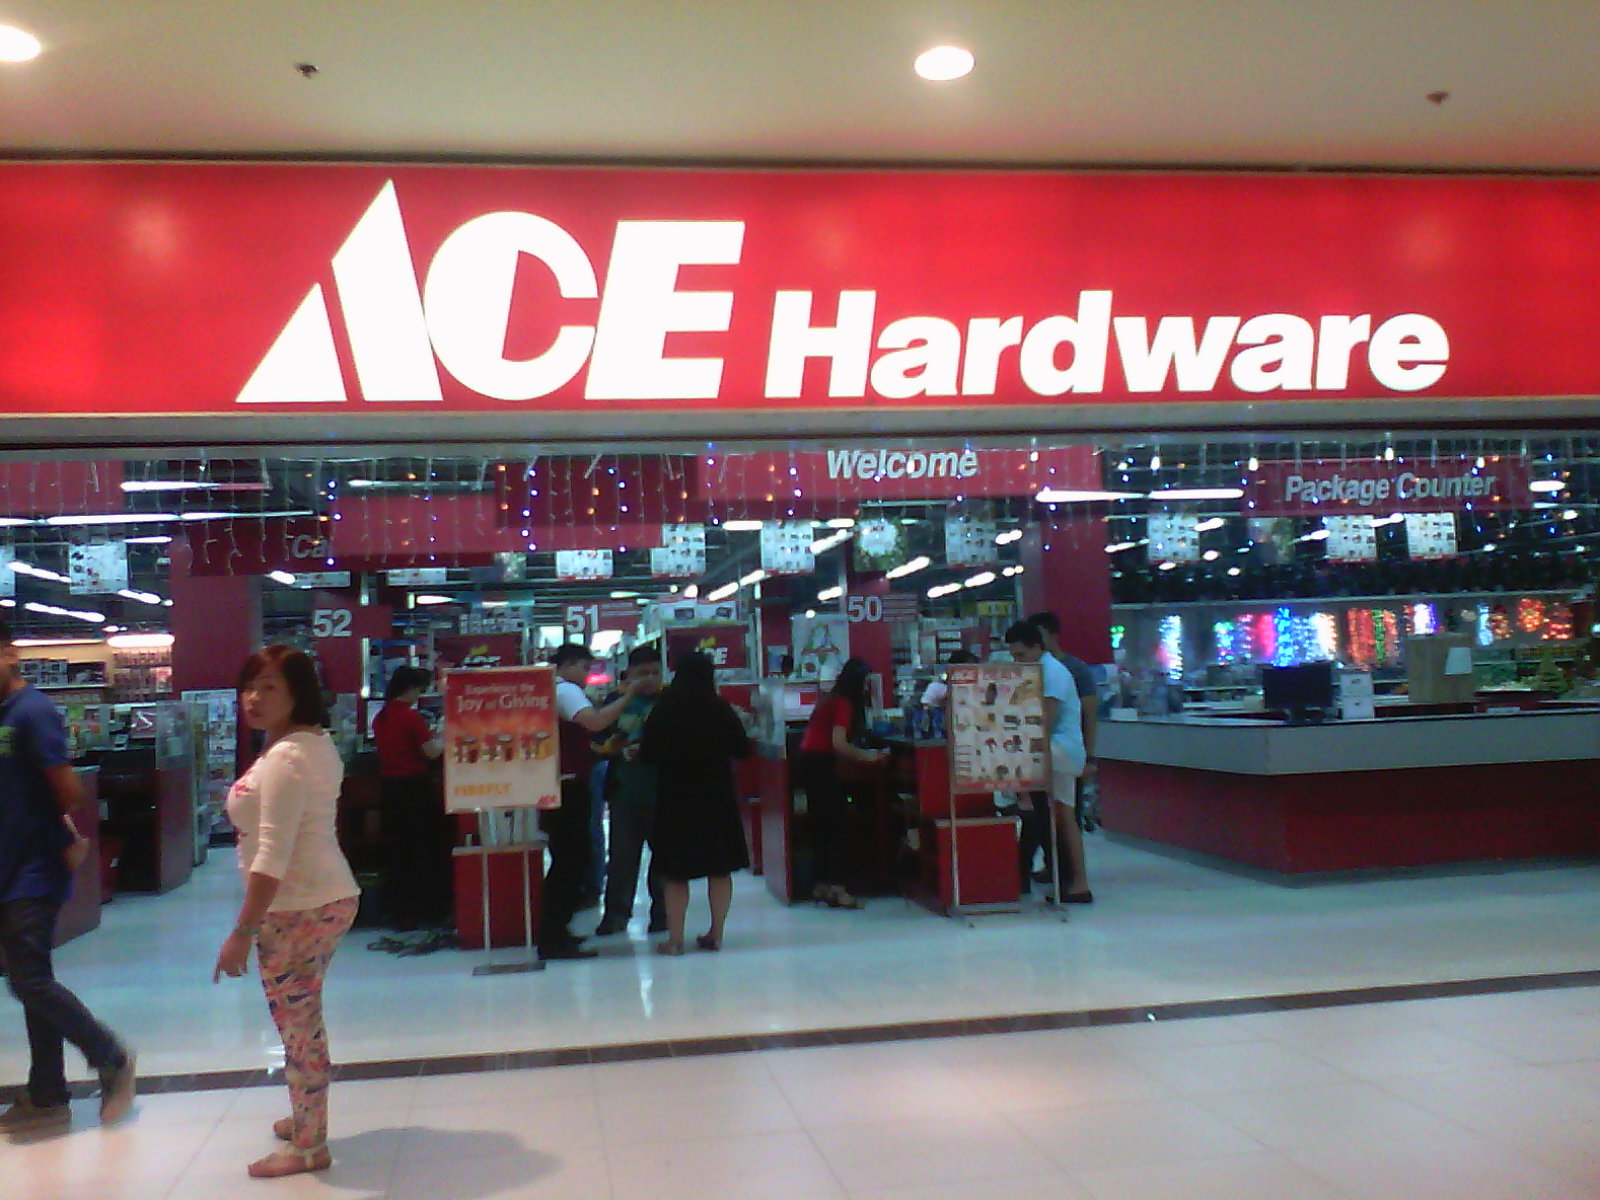 ACES Ace Hardware (ACES) Tebar Dividen Rp32,15 Per Saham, Ini Jadwalnya